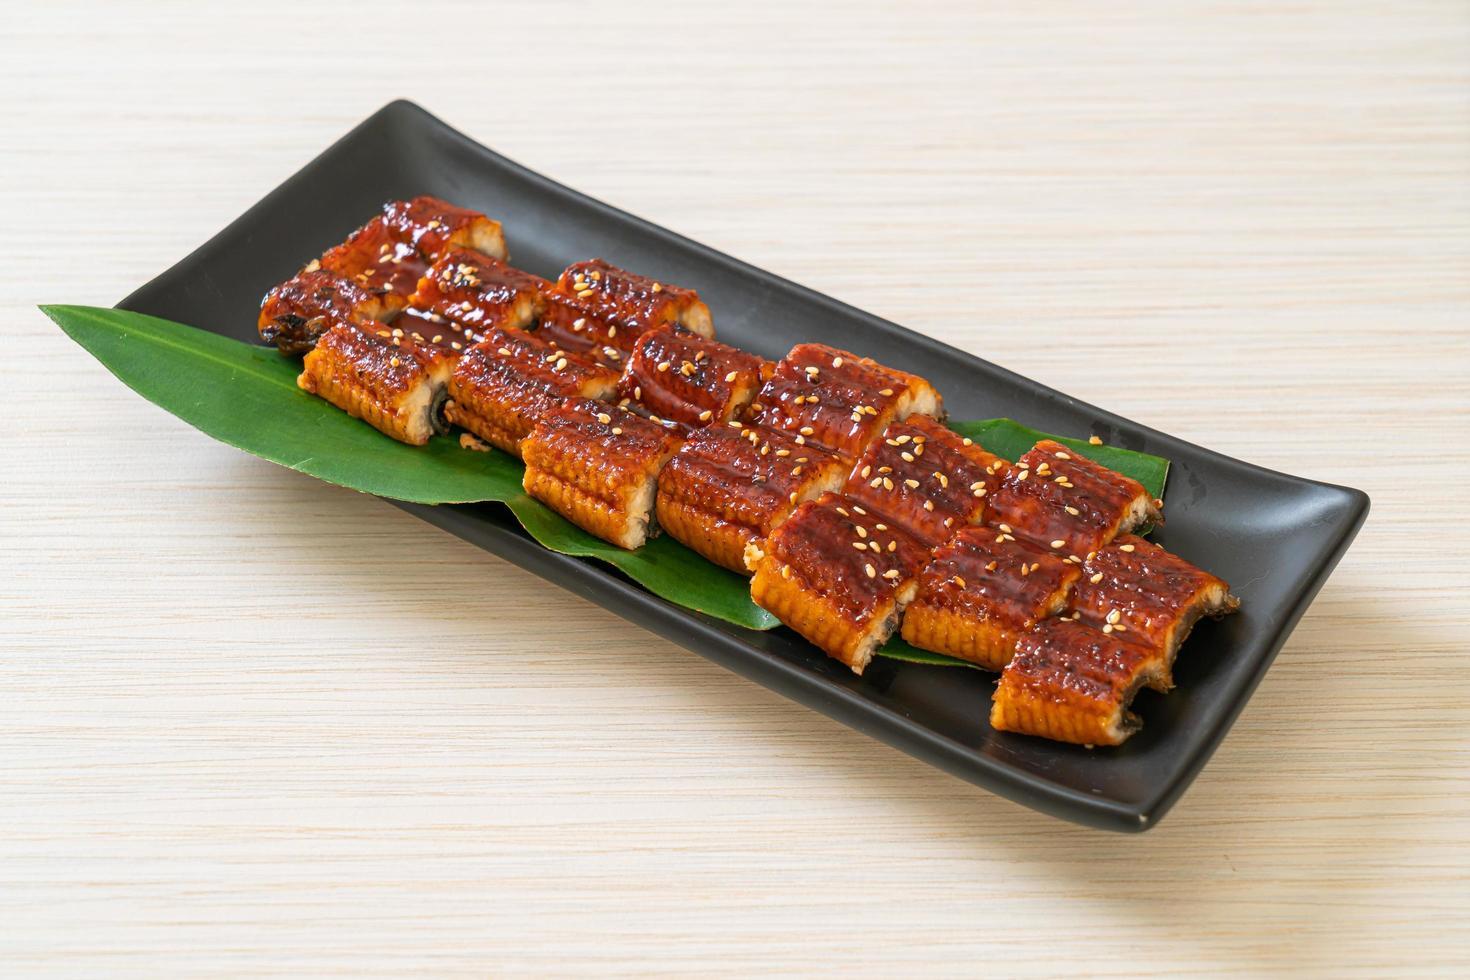 Sliced grilled eel or grilled unagi with sauce -Kabayaki - Japanese food style photo